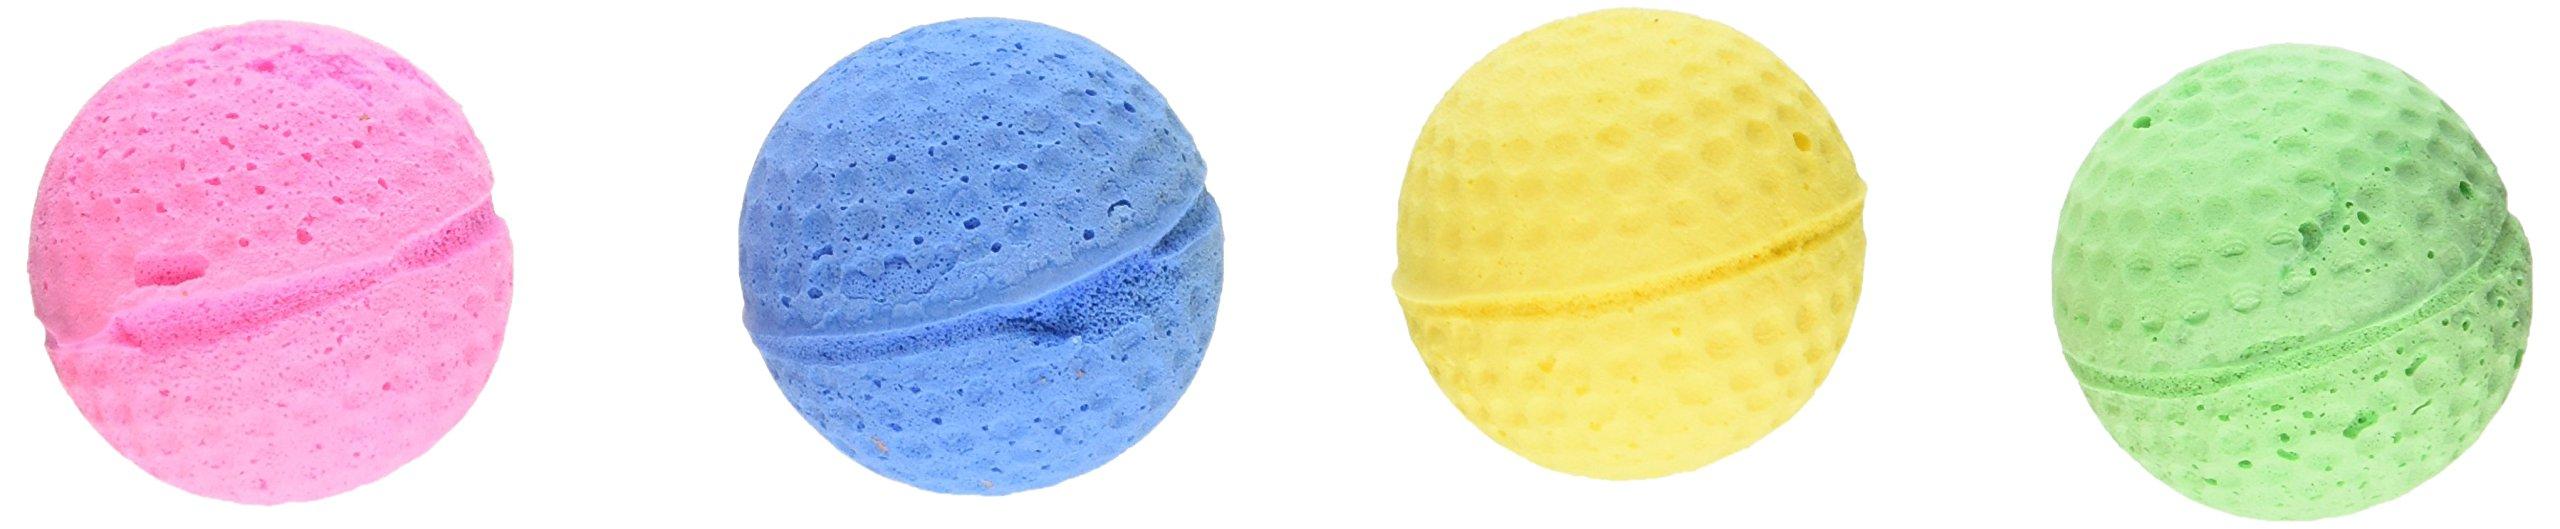 "Coastal Pet 1.5"" Sponge Ball Cat Toy Multi-Colors, 4-Count per Pack (1-Pack)"